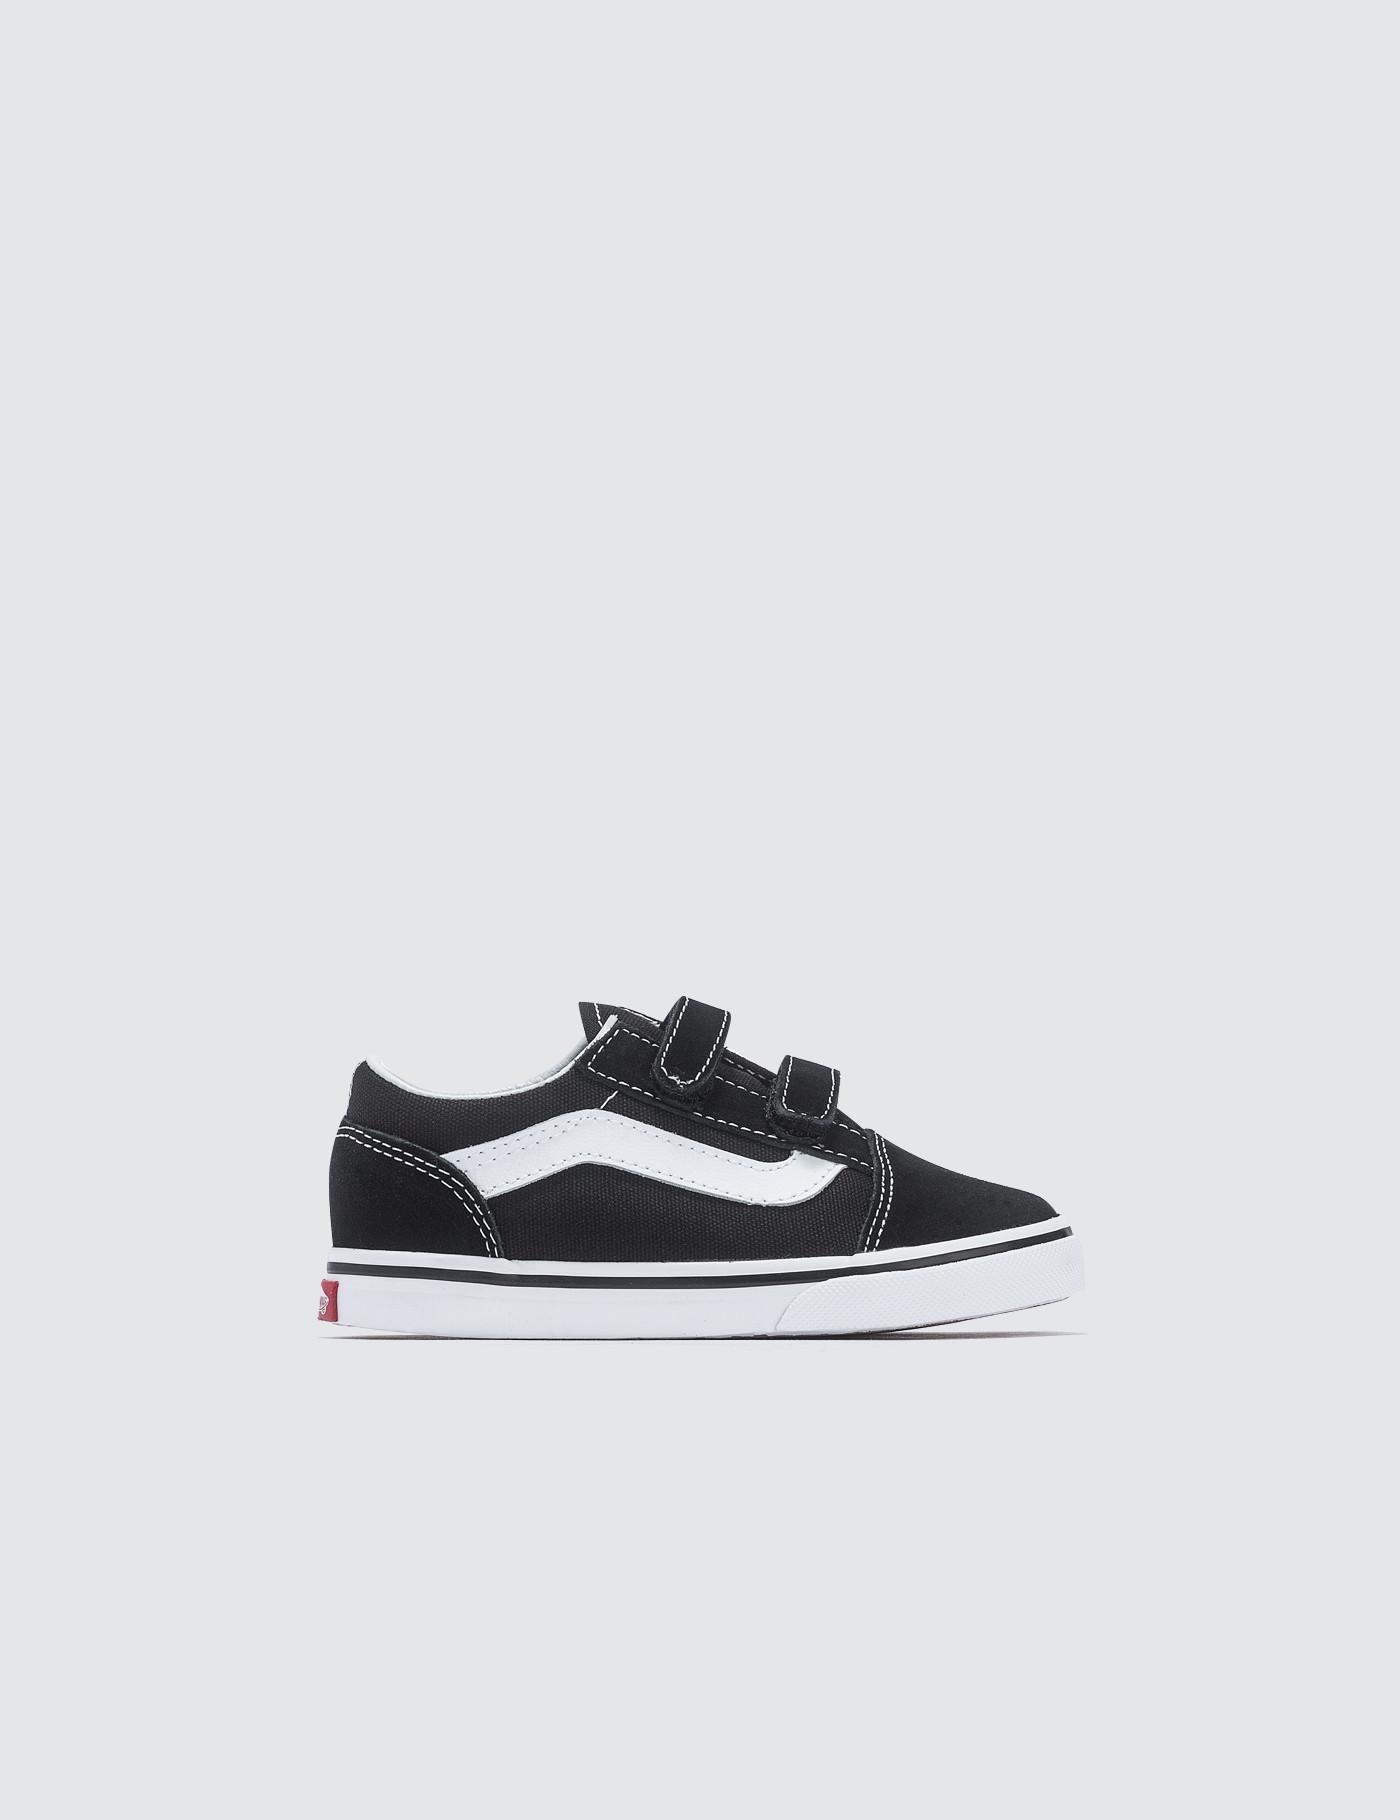 Vans Old Skool V in Black for Men - Lyst 2c6b37d4f